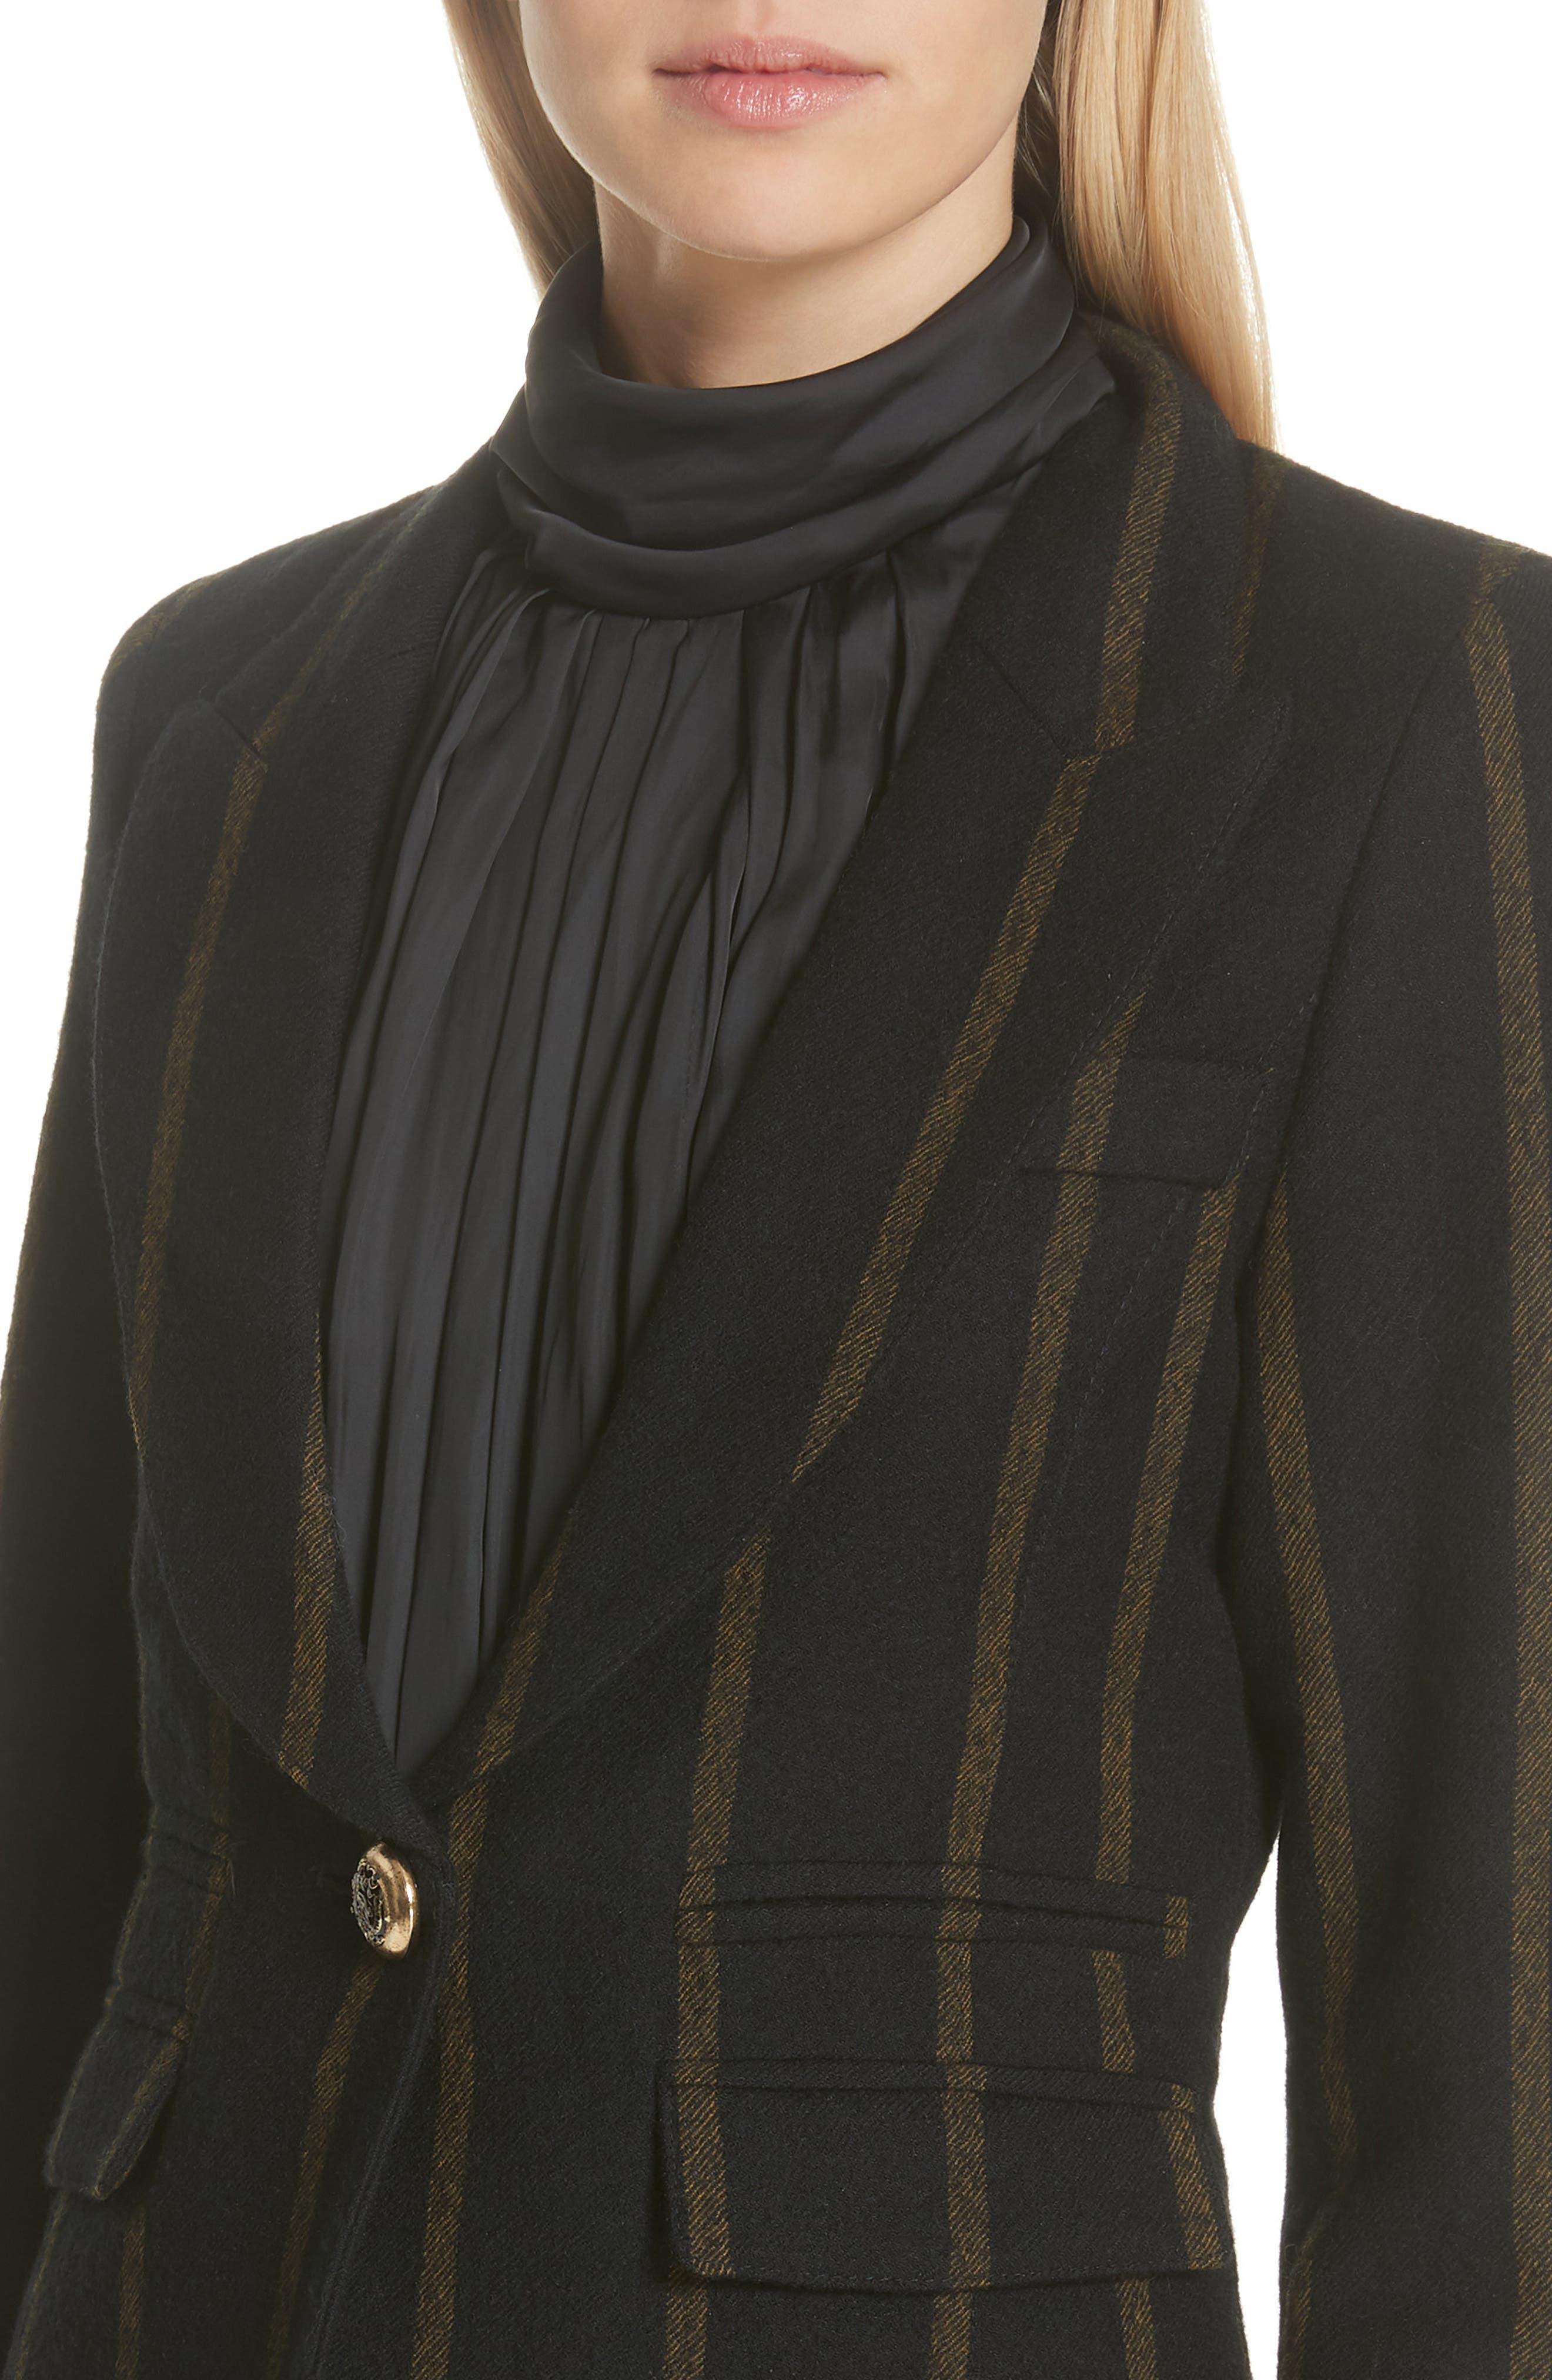 Stripe Peak Lapel Wool Blazer,                             Alternate thumbnail 4, color,                             002